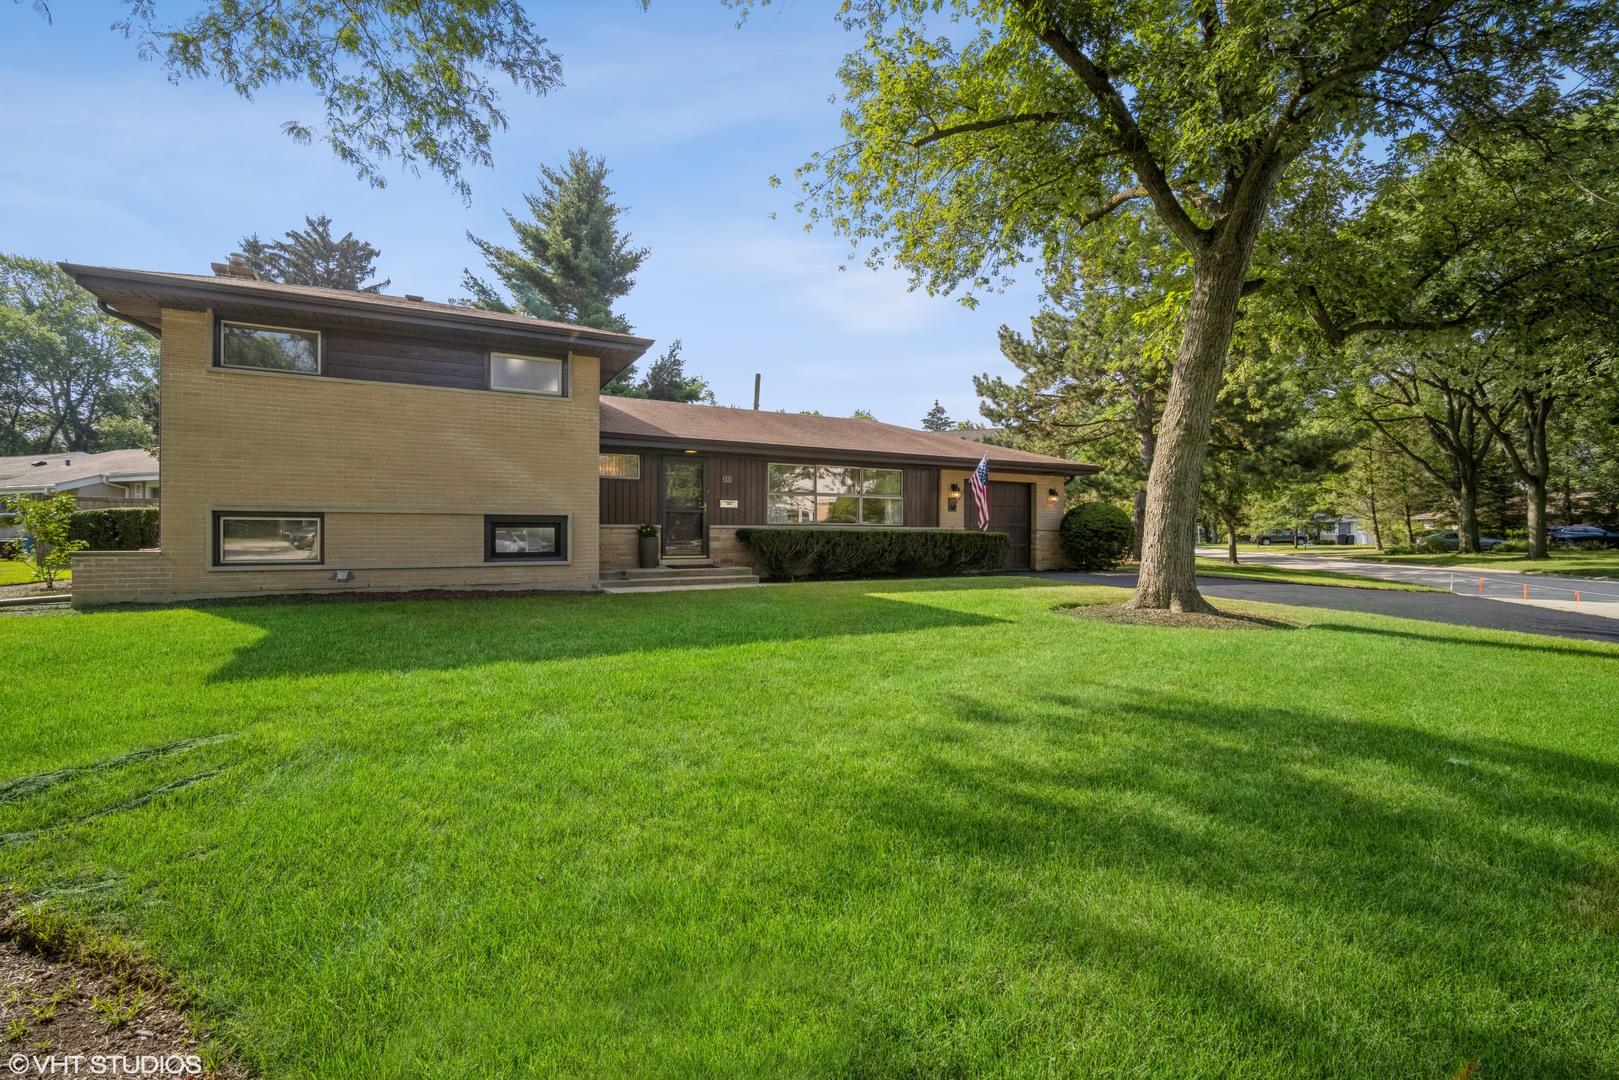 1035 Arbor Lane, Glenview, IL 60025